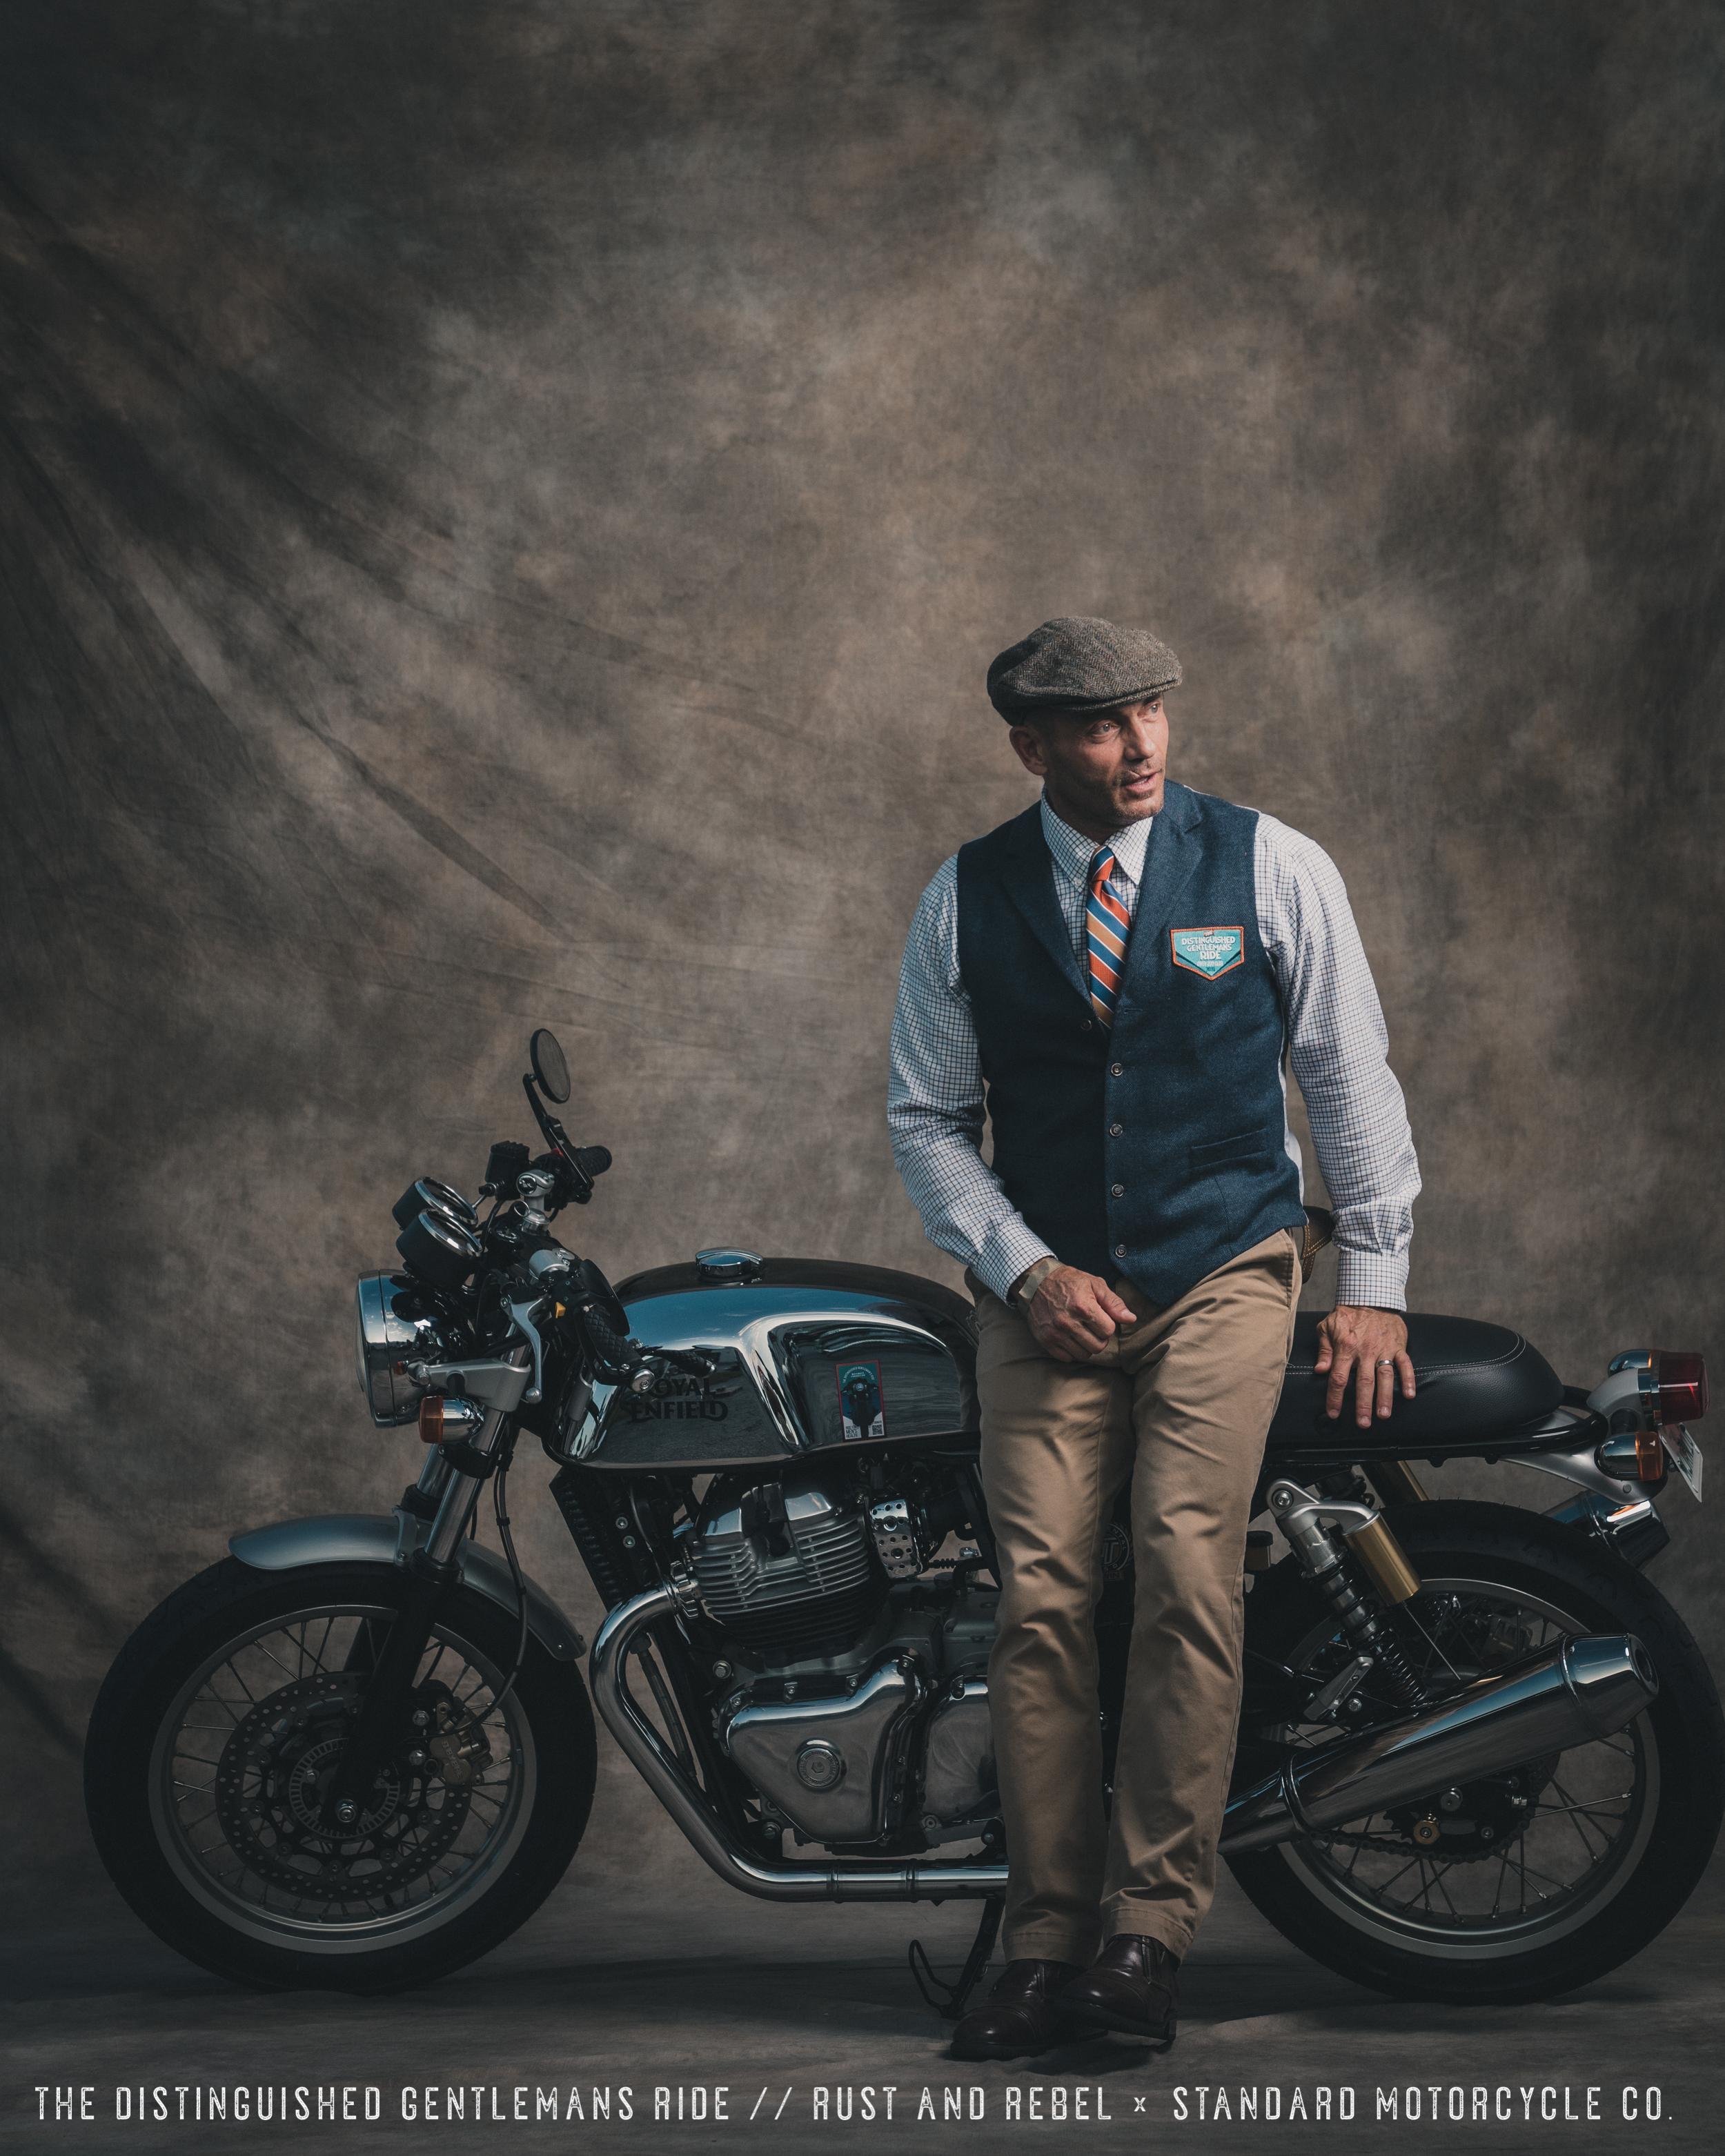 The Distinguished Gentleman's Ride 2019 [PEOPLE - PHOTO BY @MIKEDUNNUSA] - 0116.jpg